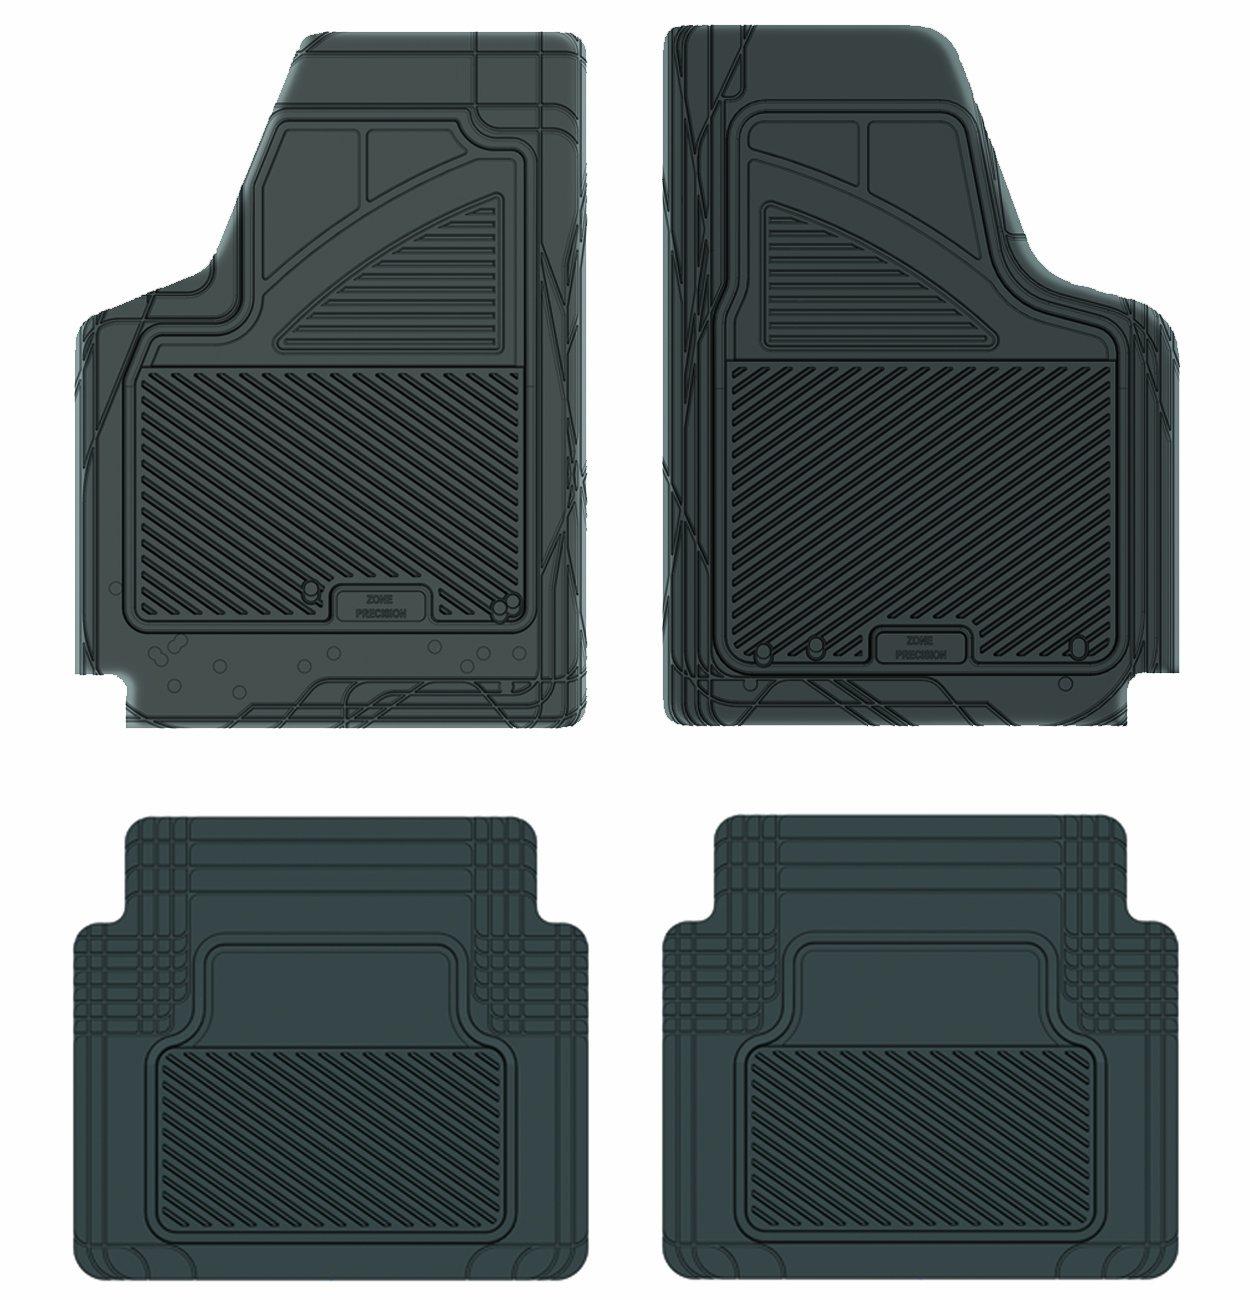 Koolatron Pants Saver Custom Fit 4 Piece All Weather Car Mat for Select Chevrolet Impala Models Black